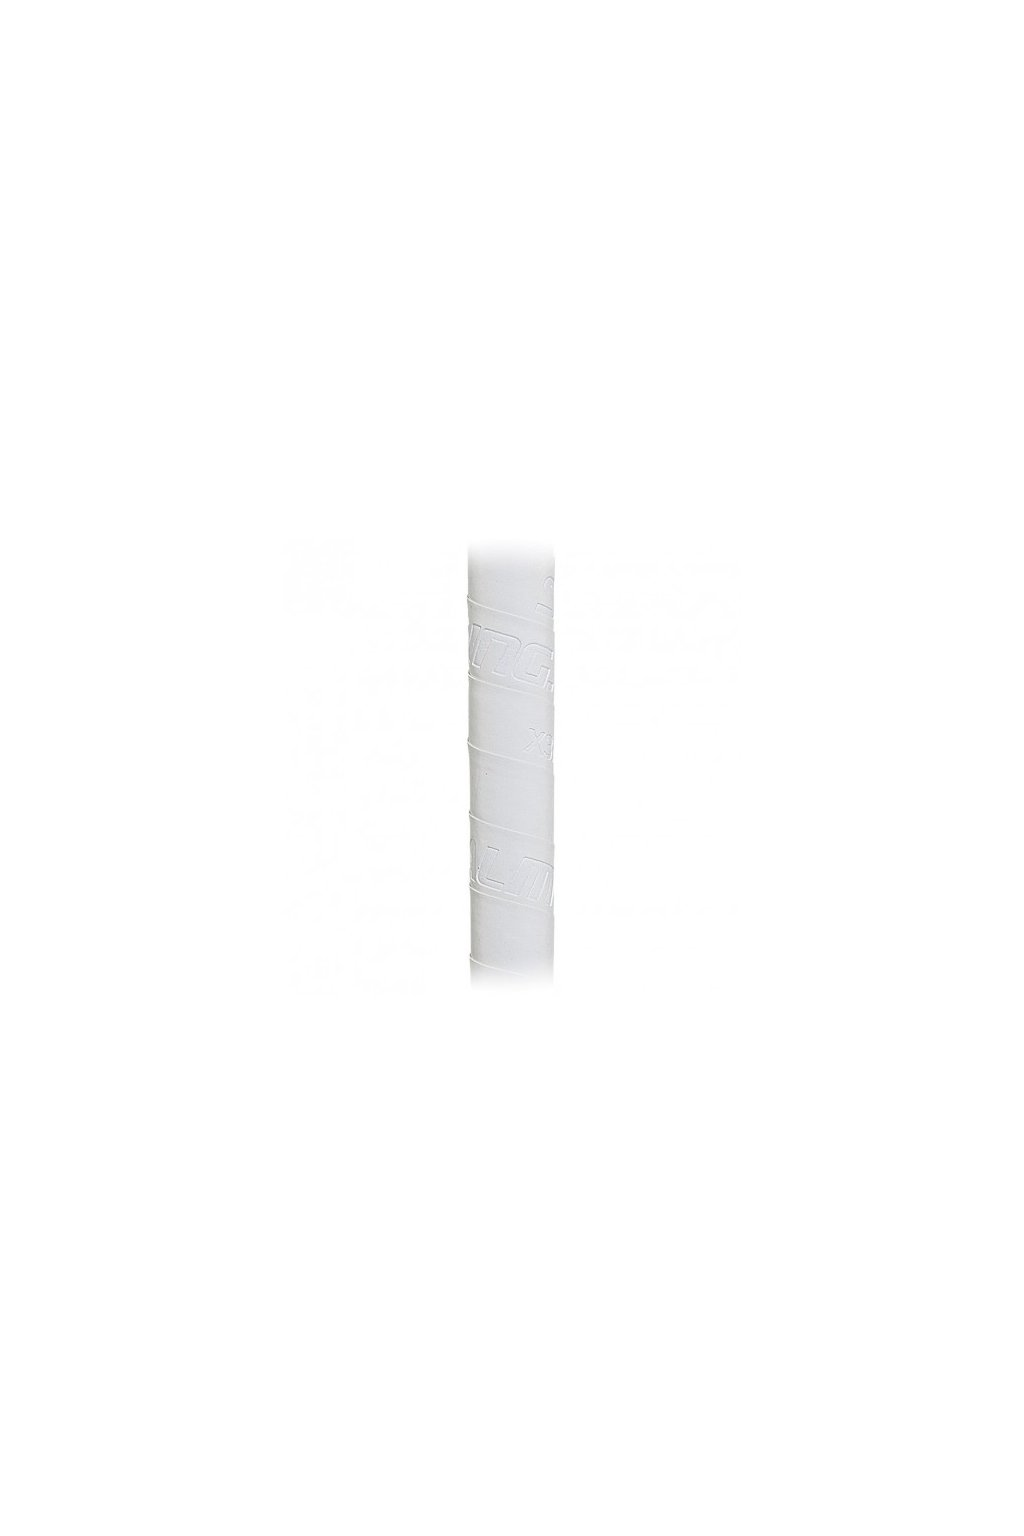 SALMING X3M Pro Grip White